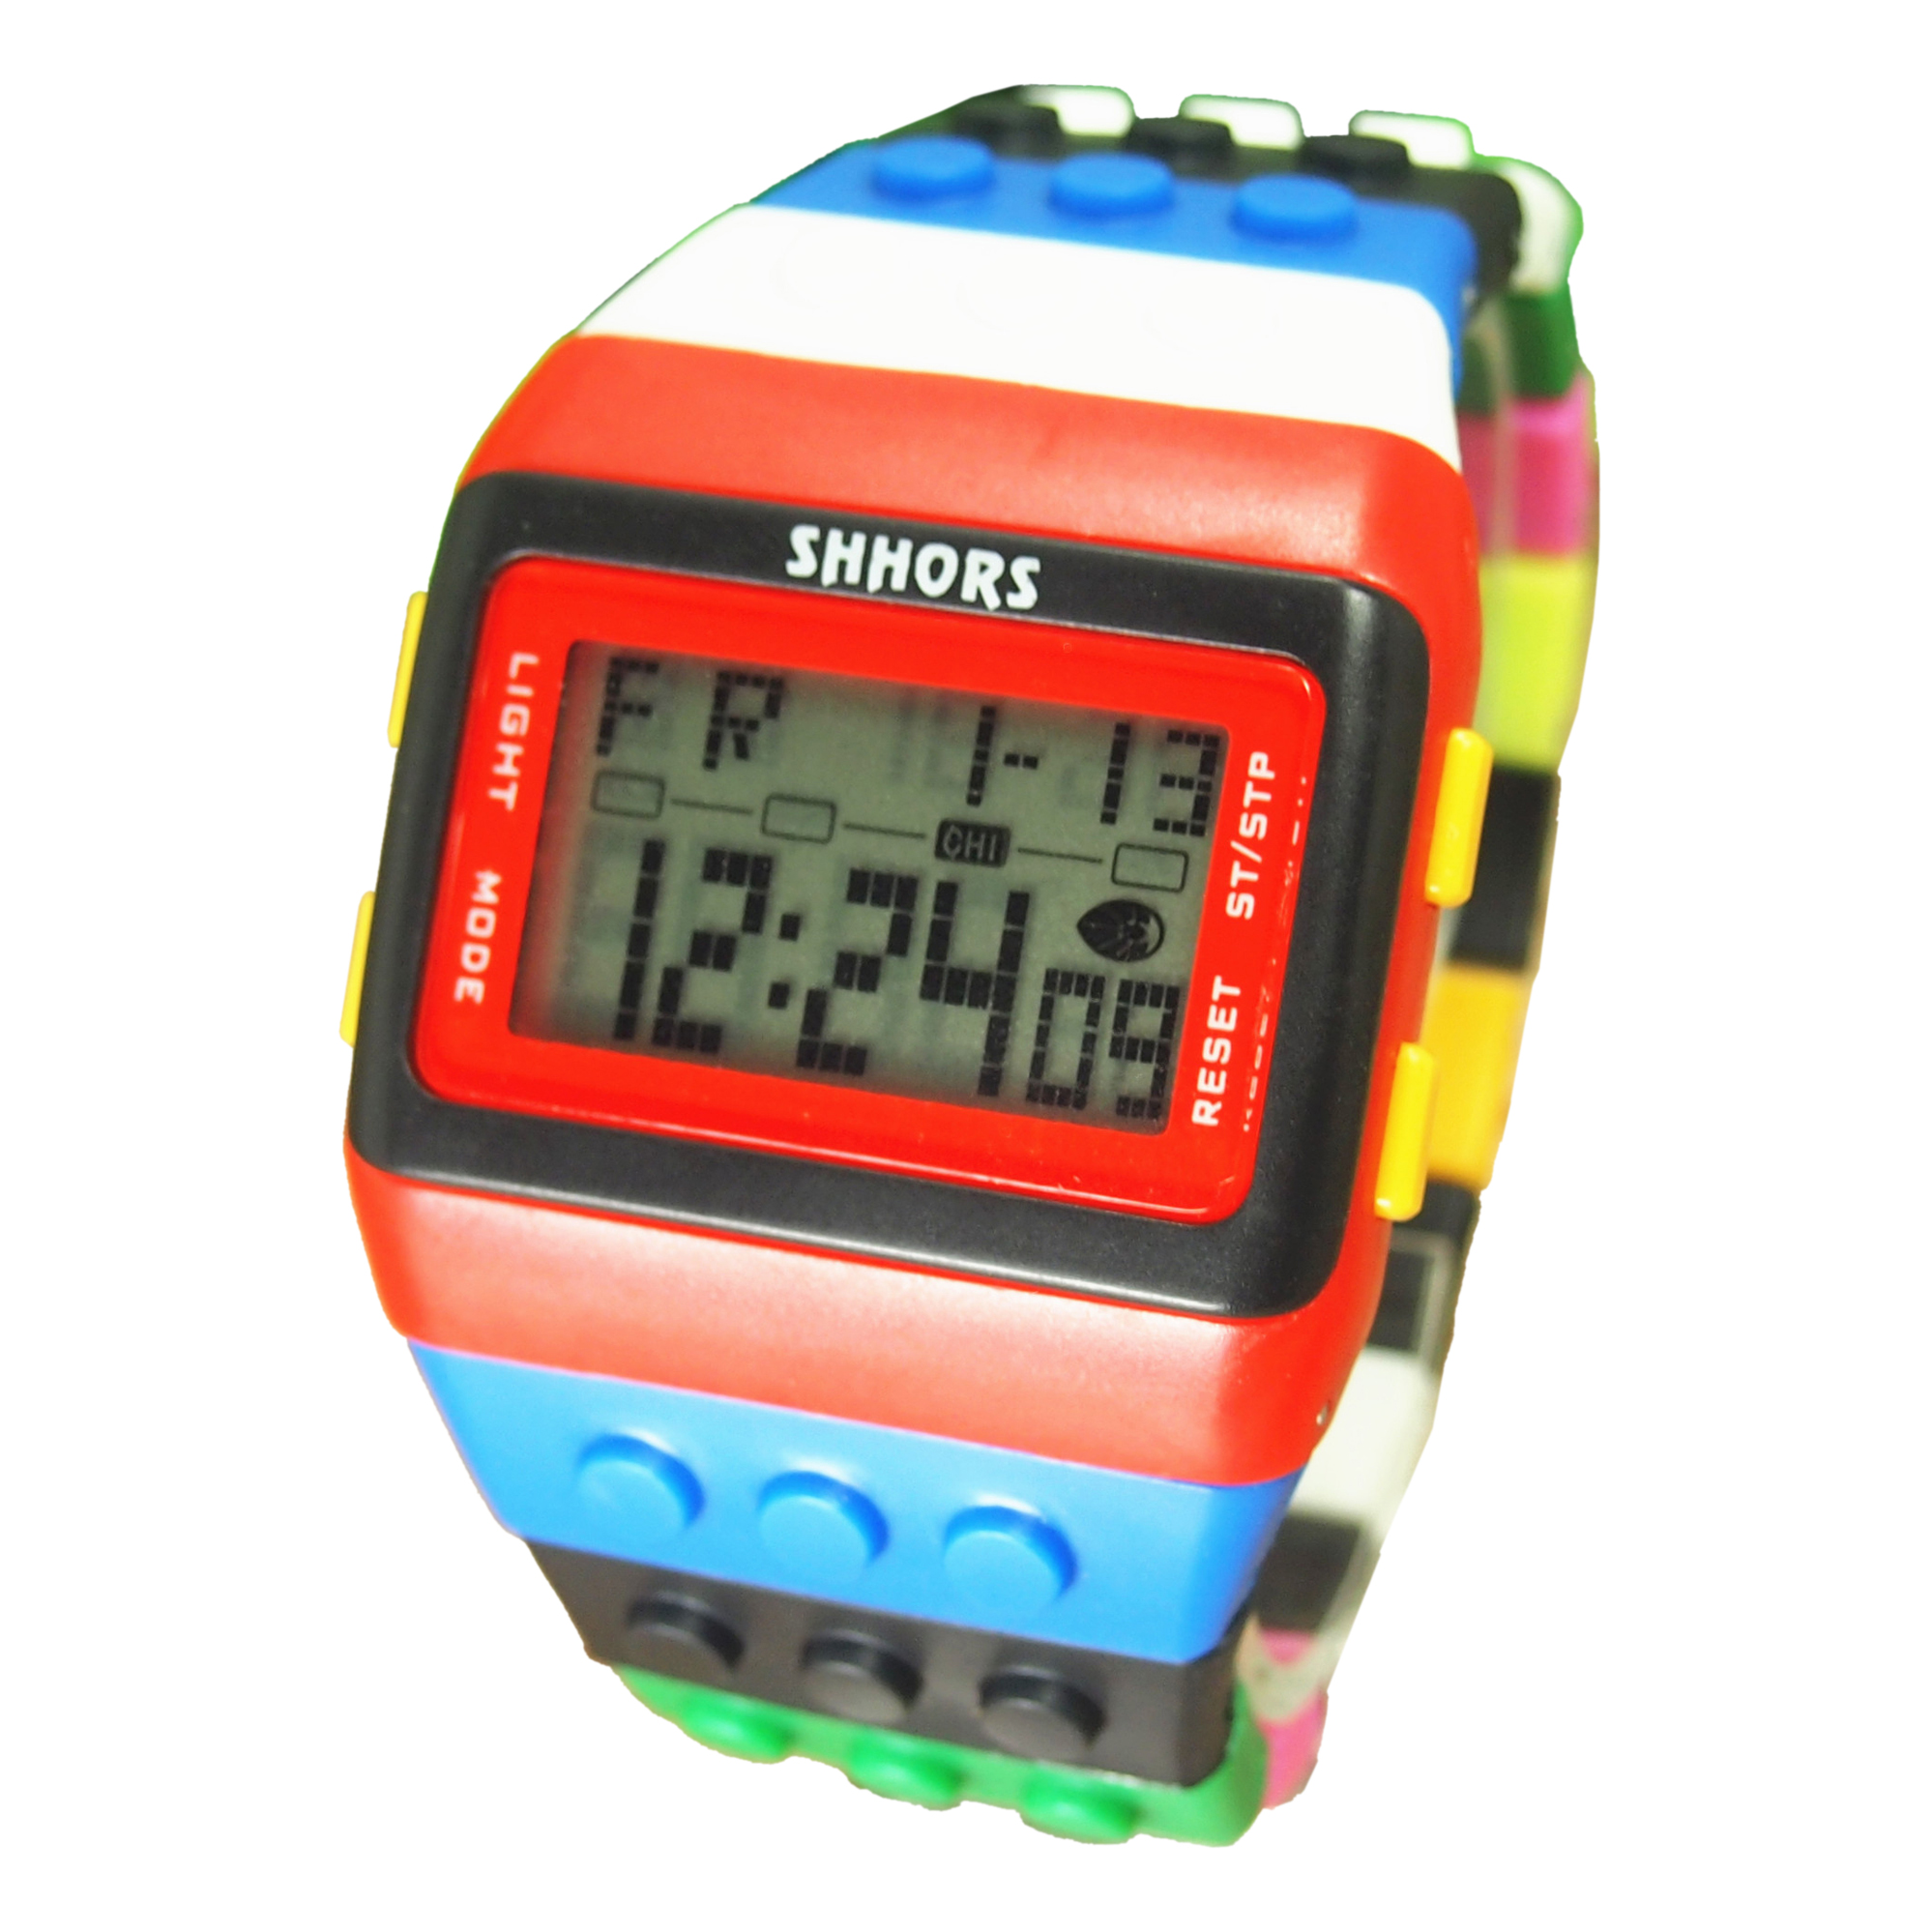 SHHORS Rainbow Color Multifunction Waterproof LED Children Wrist Watch Swimming Sports Watch Digital Wrist Watch (style 8)